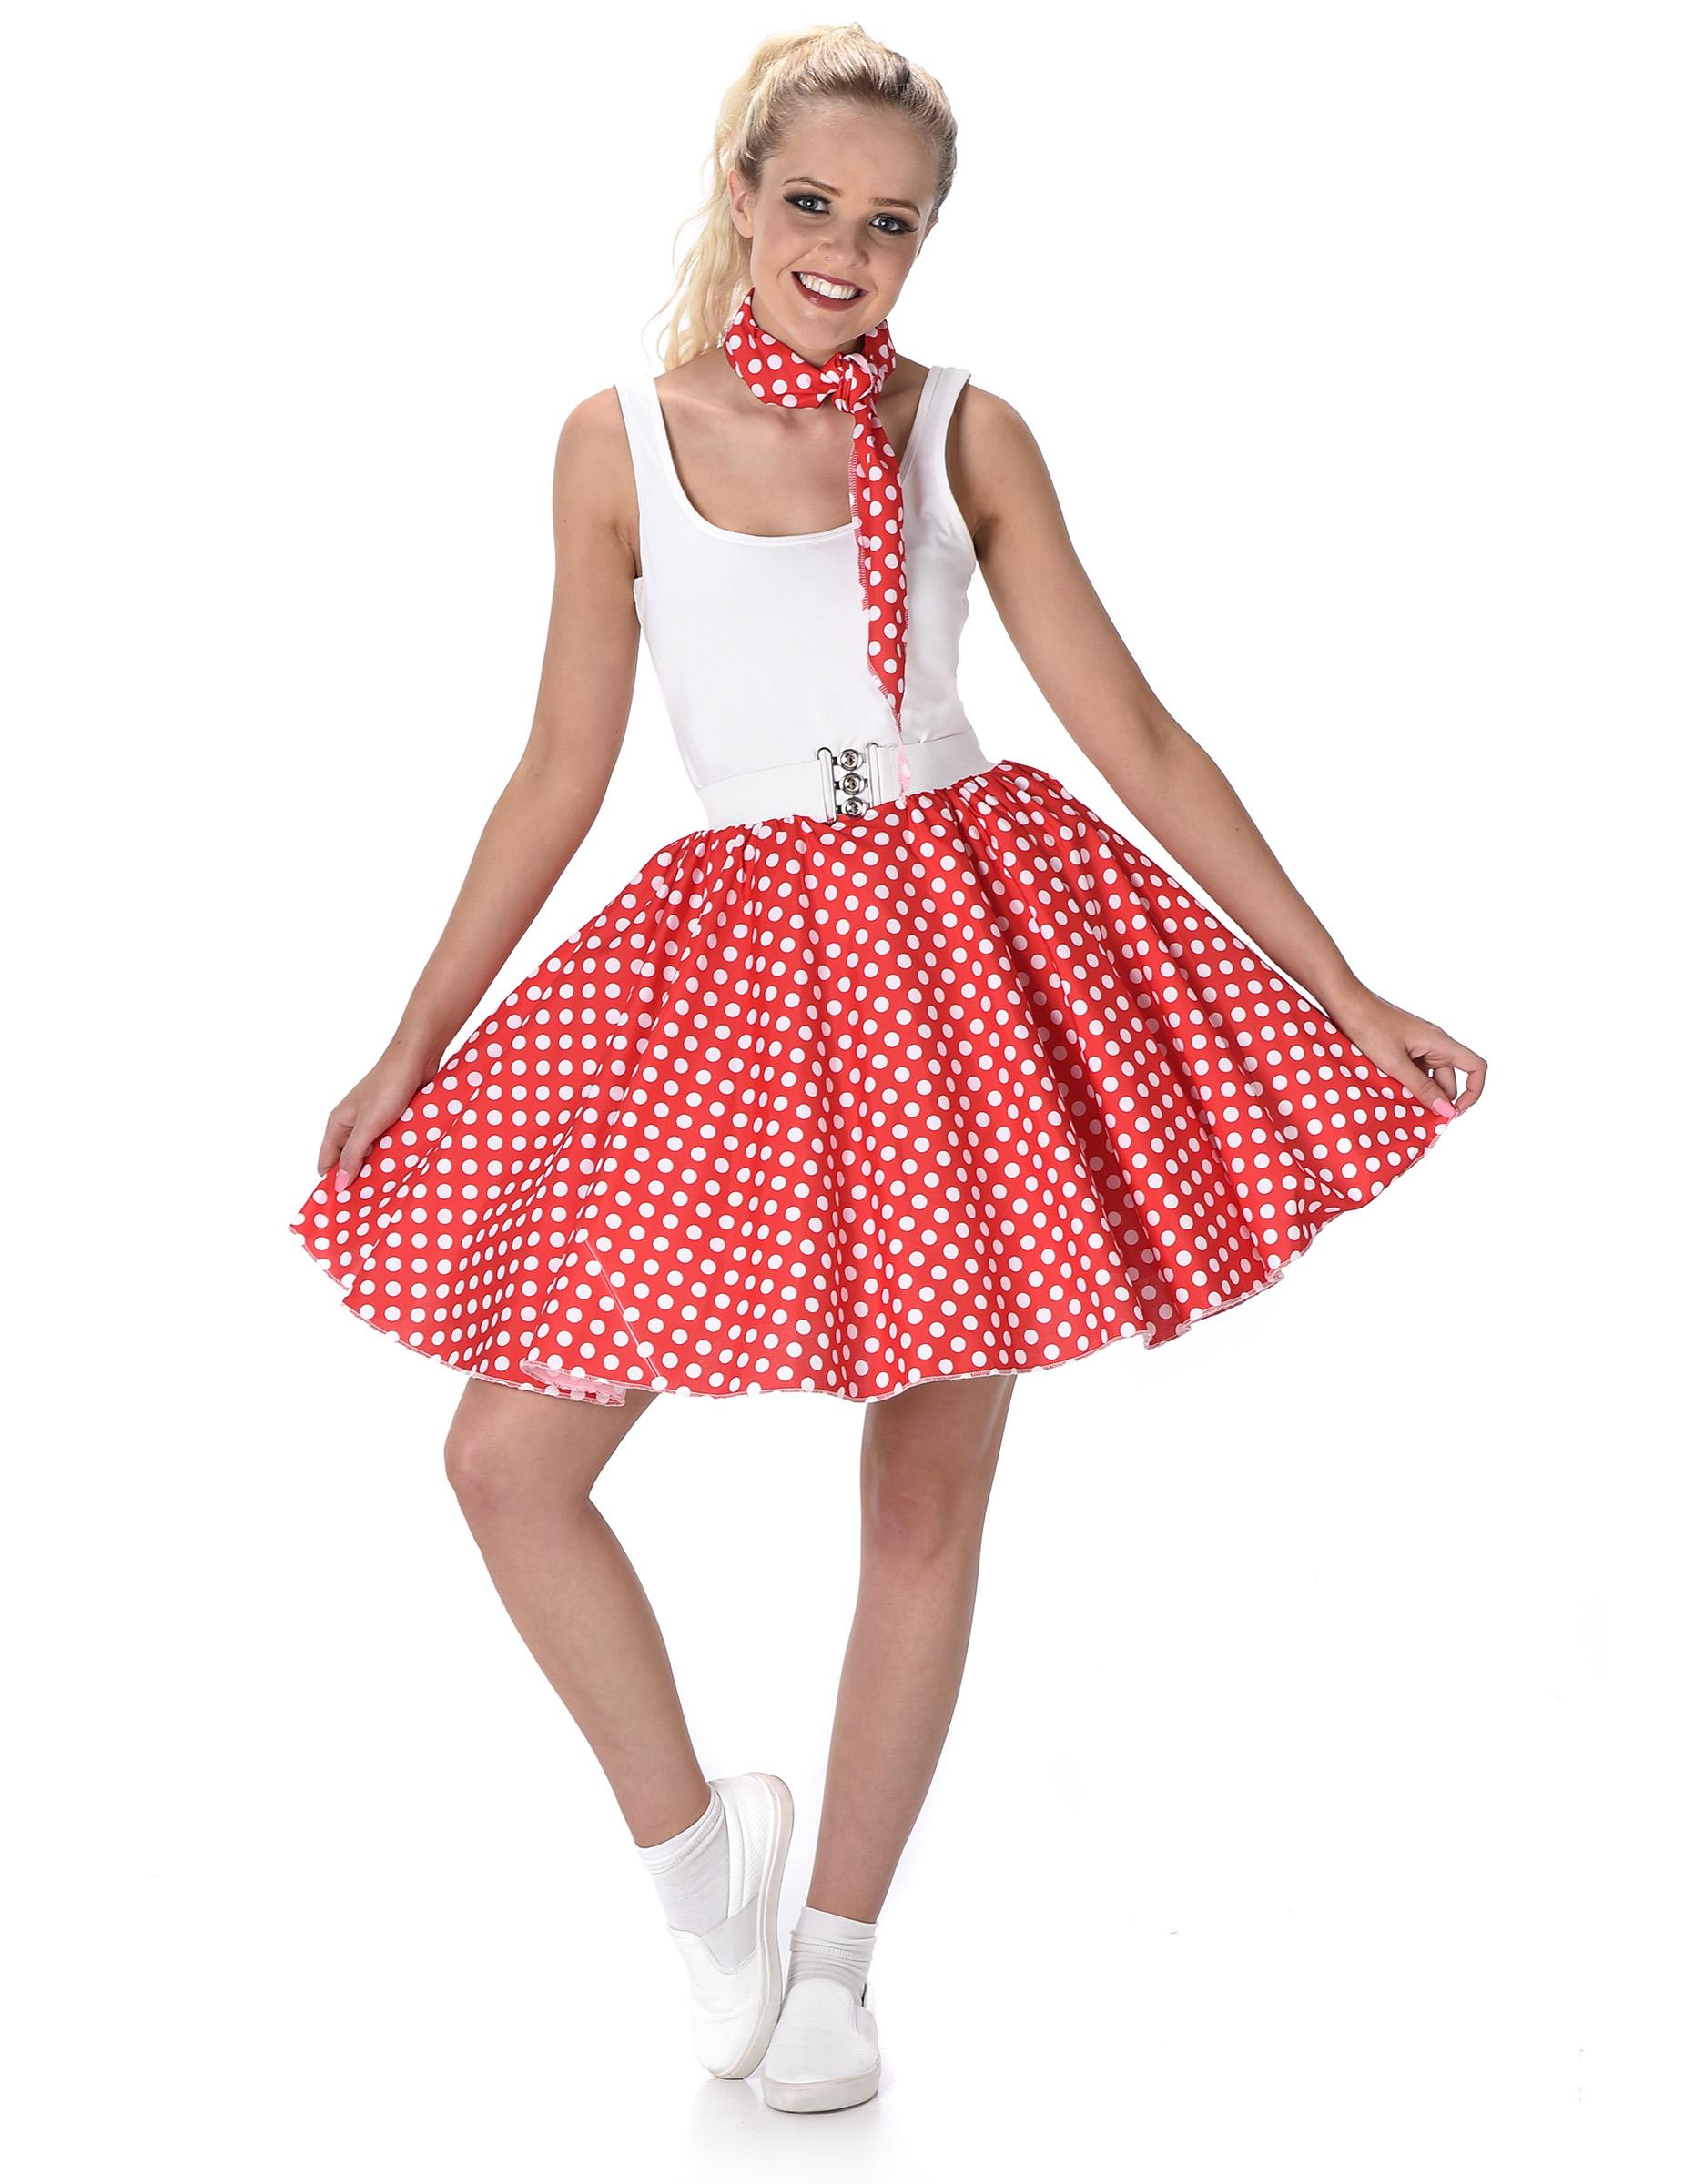 e1fc414787b1d4 60er Jahre Petticoat Rot Rockabilly Rock Mit Halstuch - OneLetter.CO